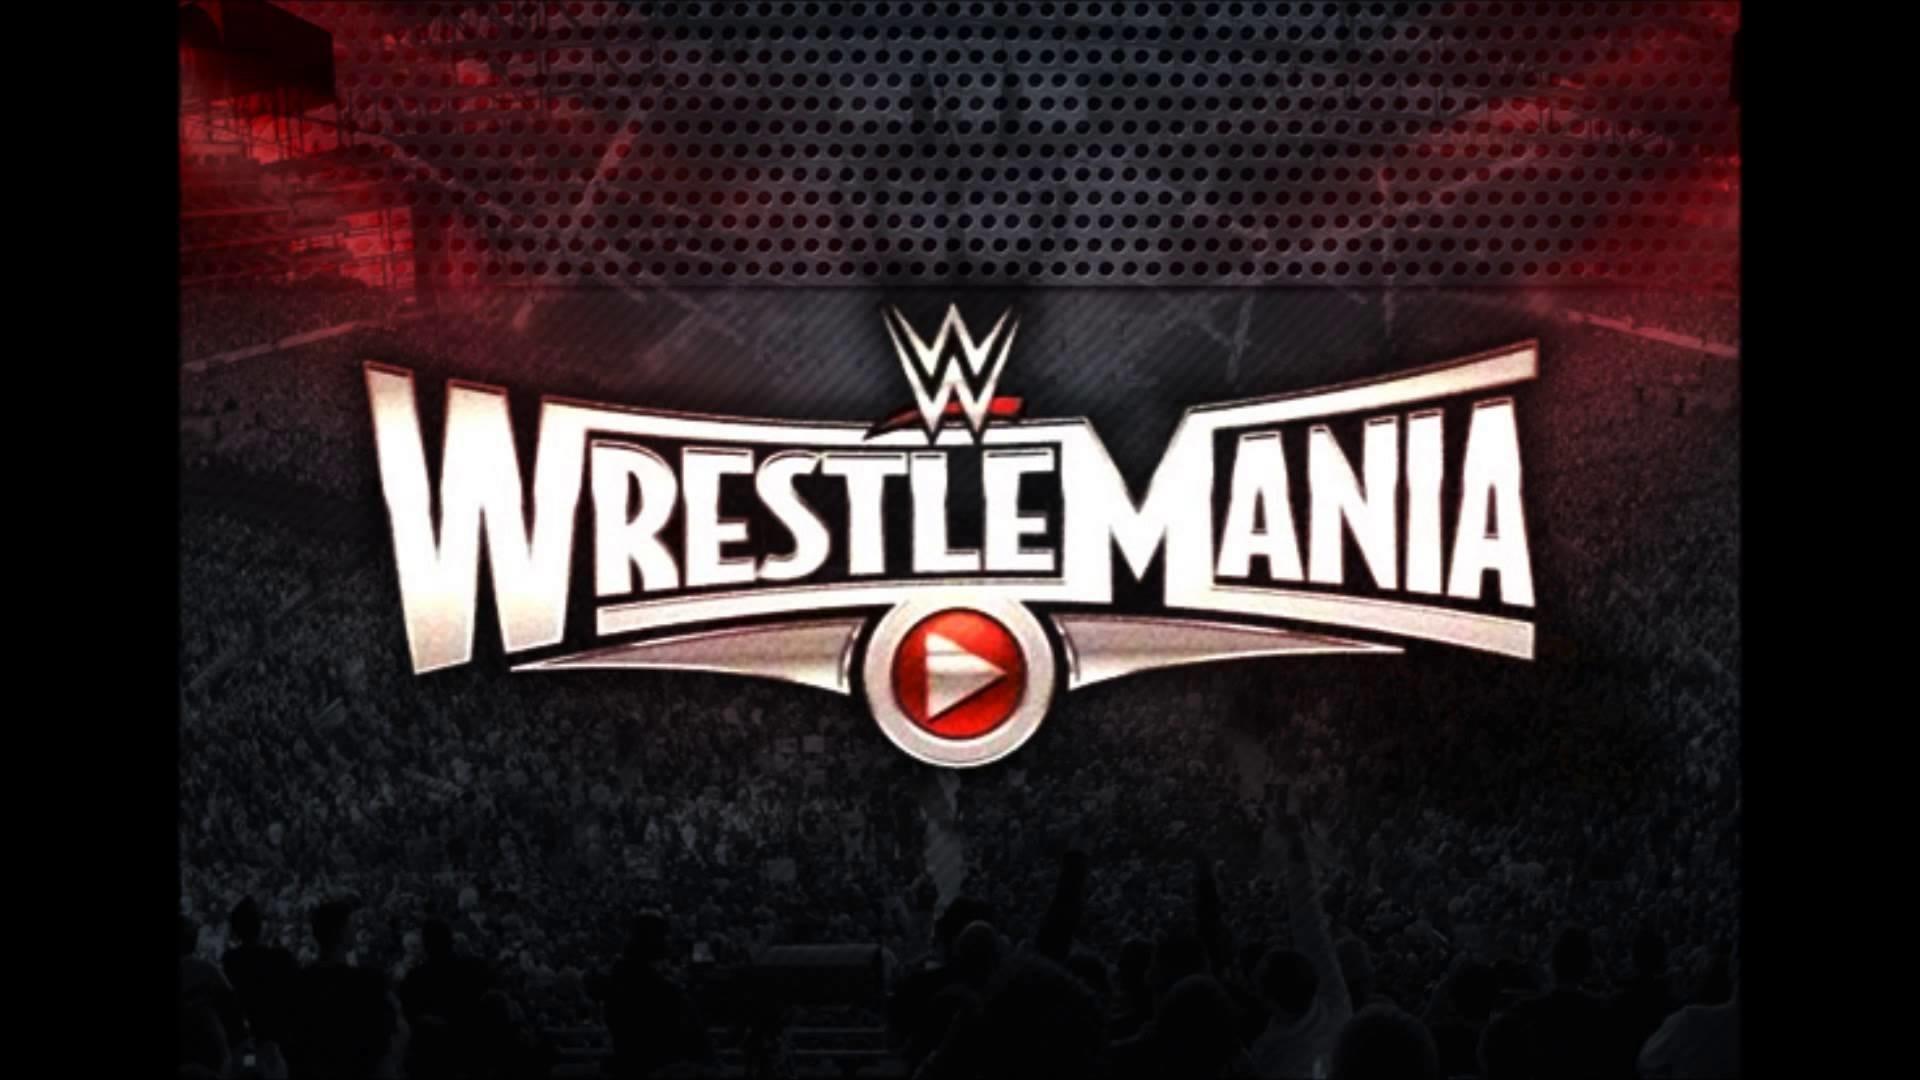 WWE Wrestlemania 31 Wallpaper (80+ images).